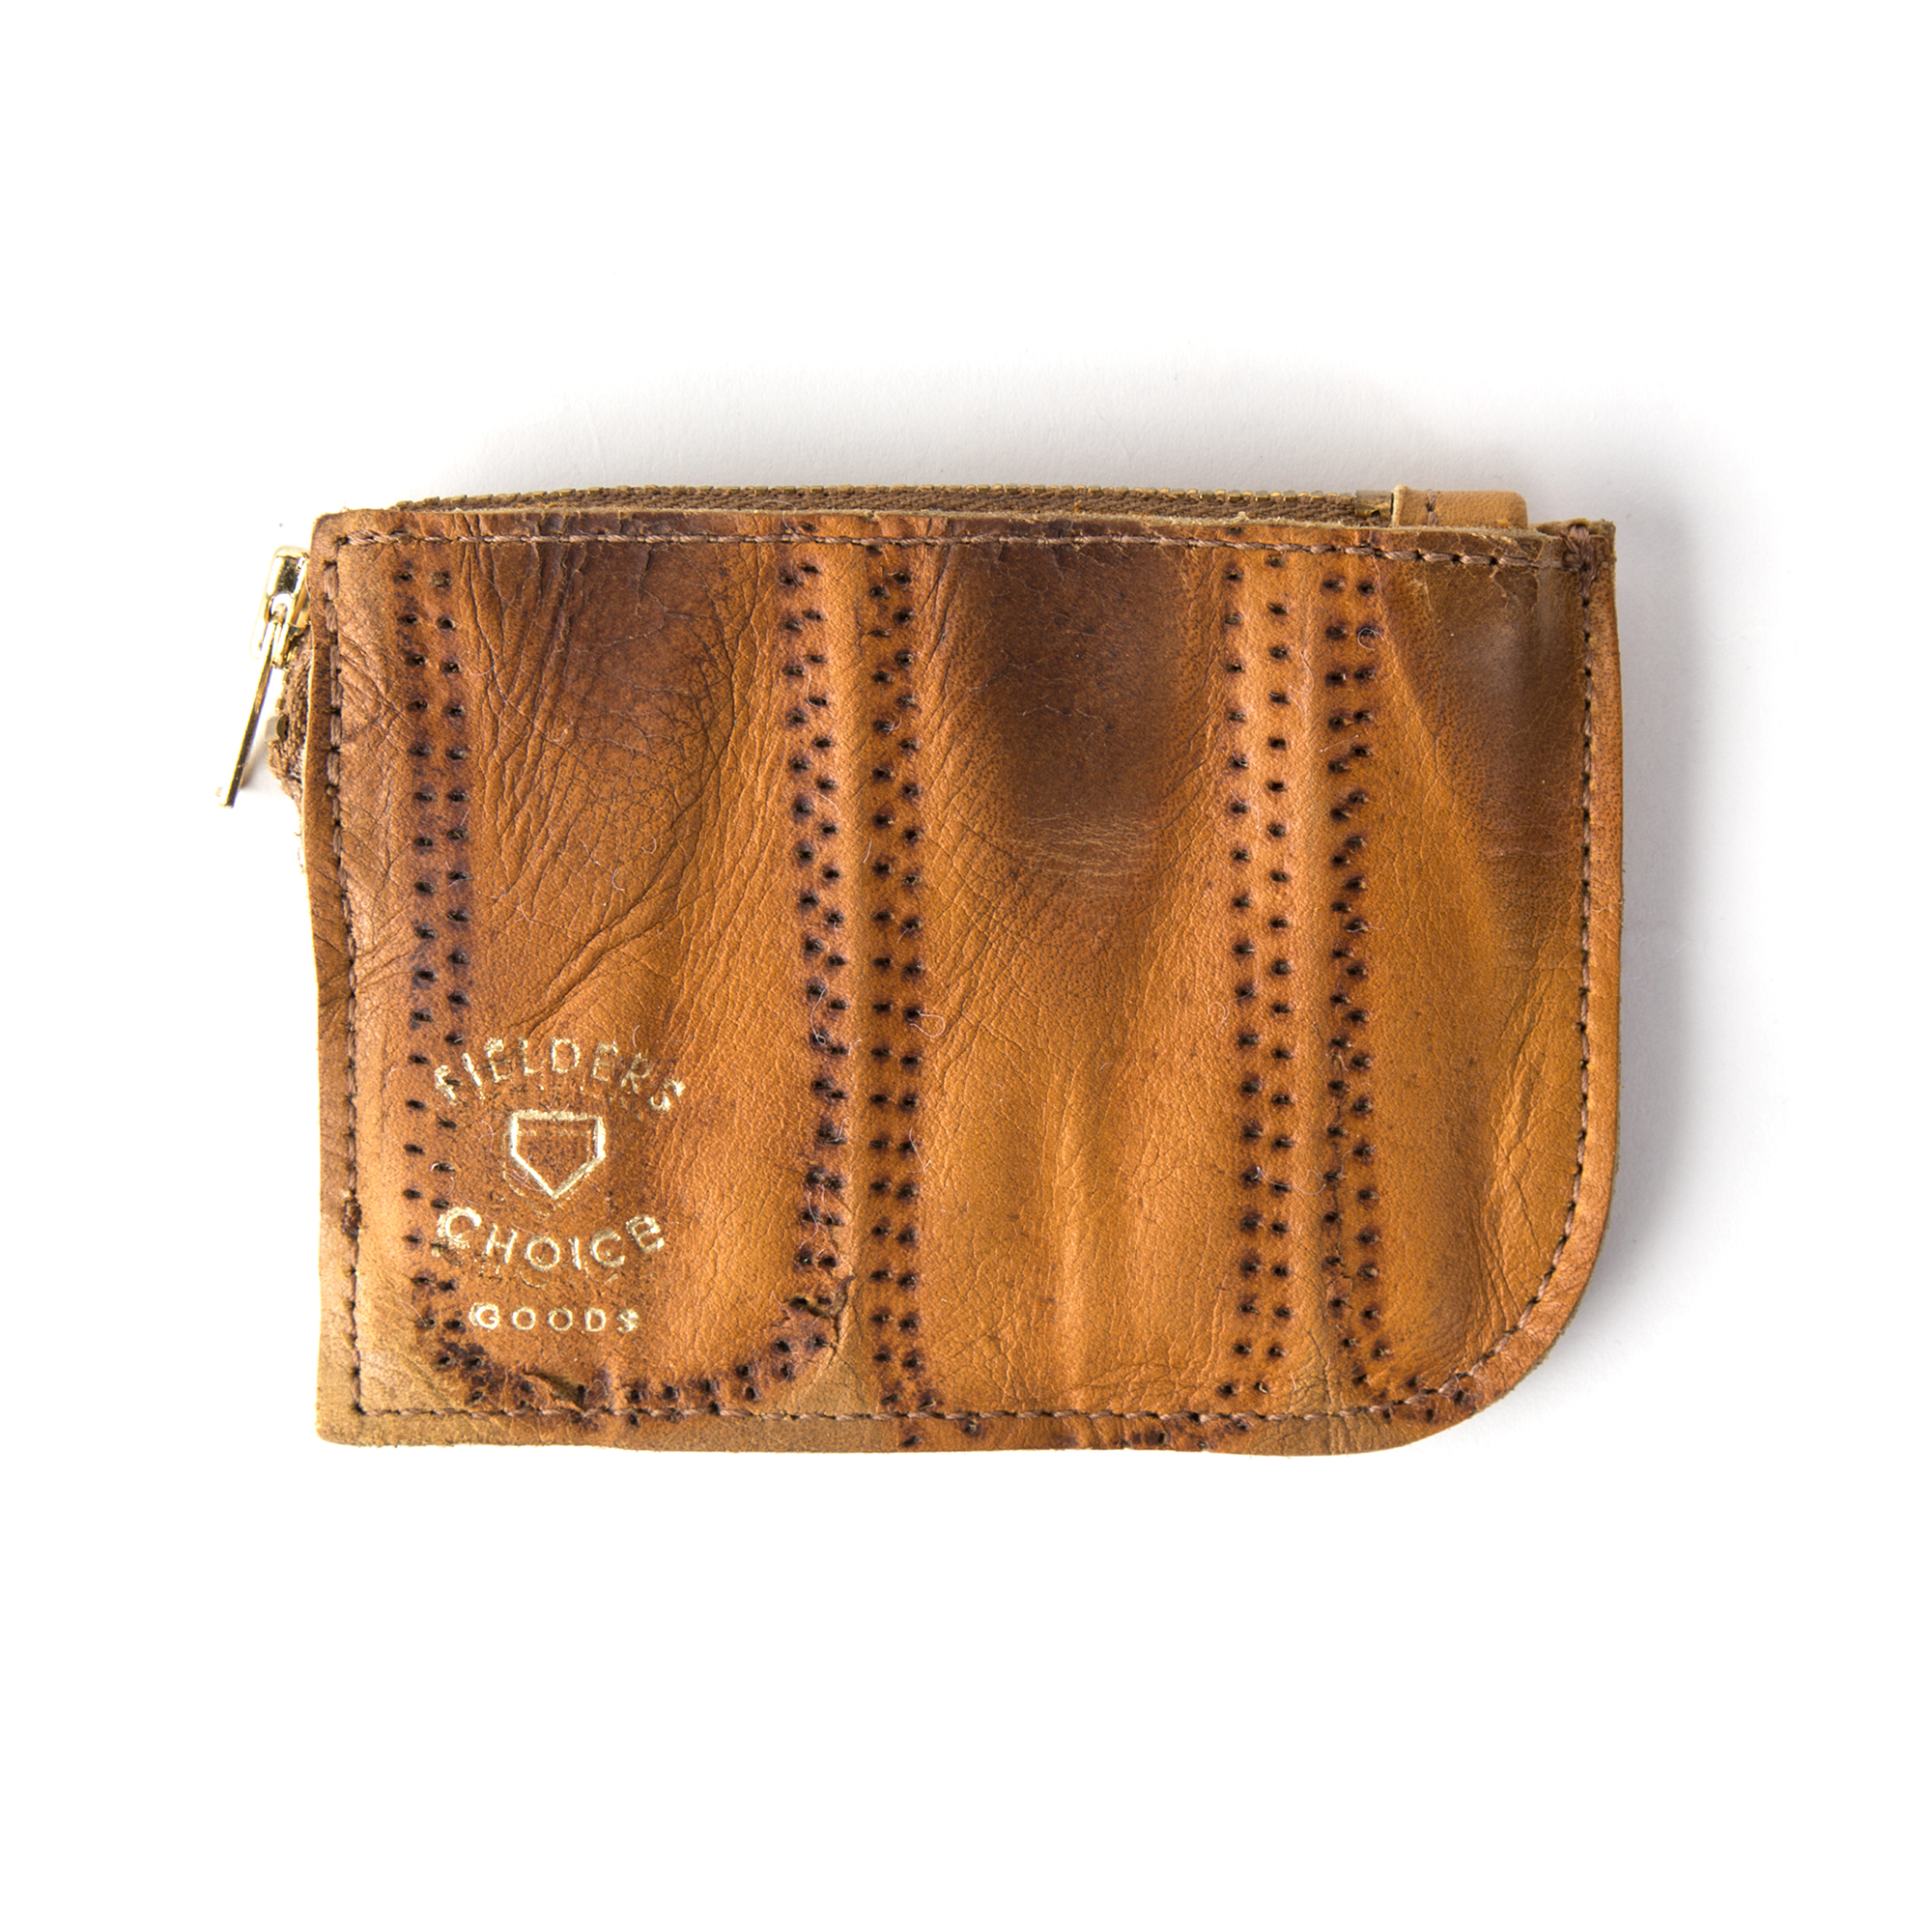 Recycled baseball glove wallet - Fielder S Choice Goods Vintage Baseball Glove Zip Wallet 4 Bespoke Post